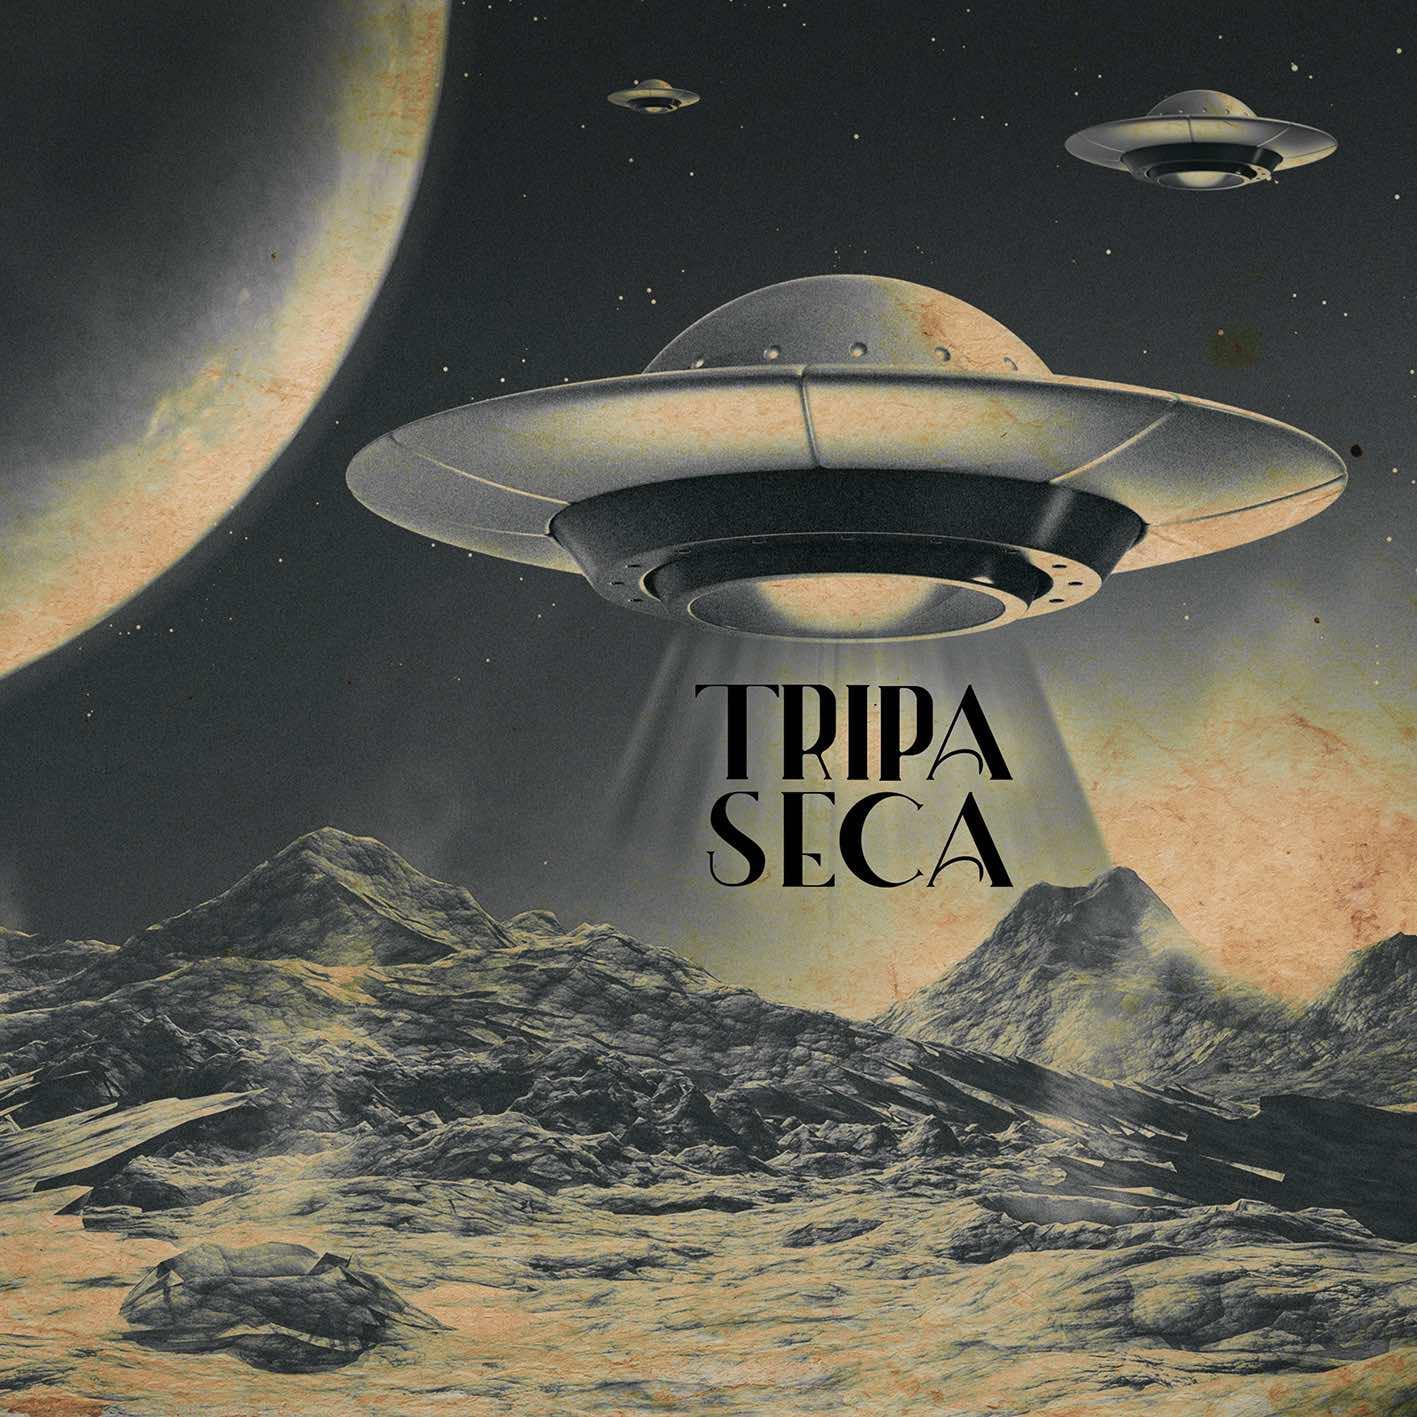 TRIPA SECA Capa